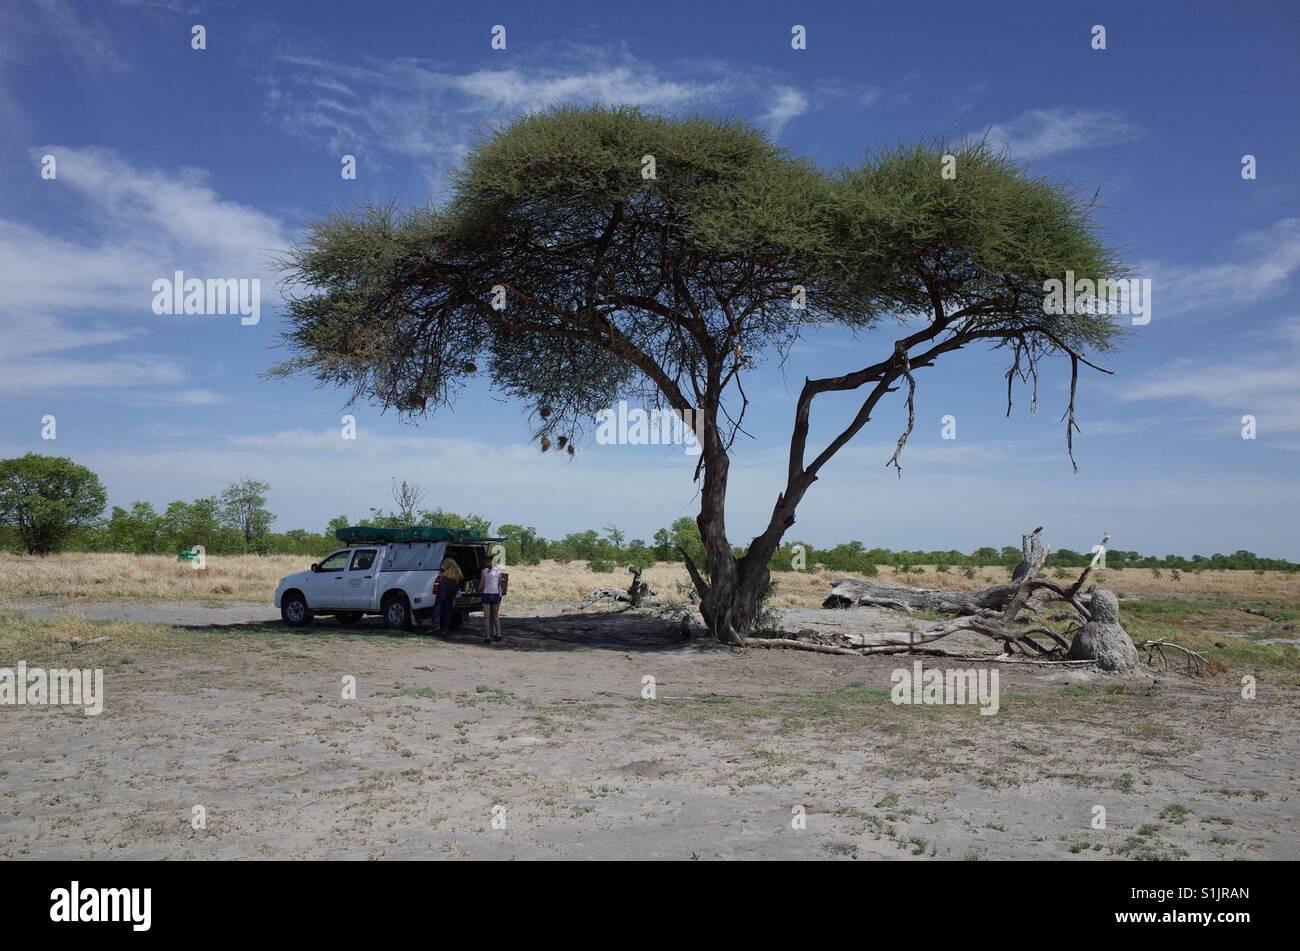 Africa safari - Stock Image